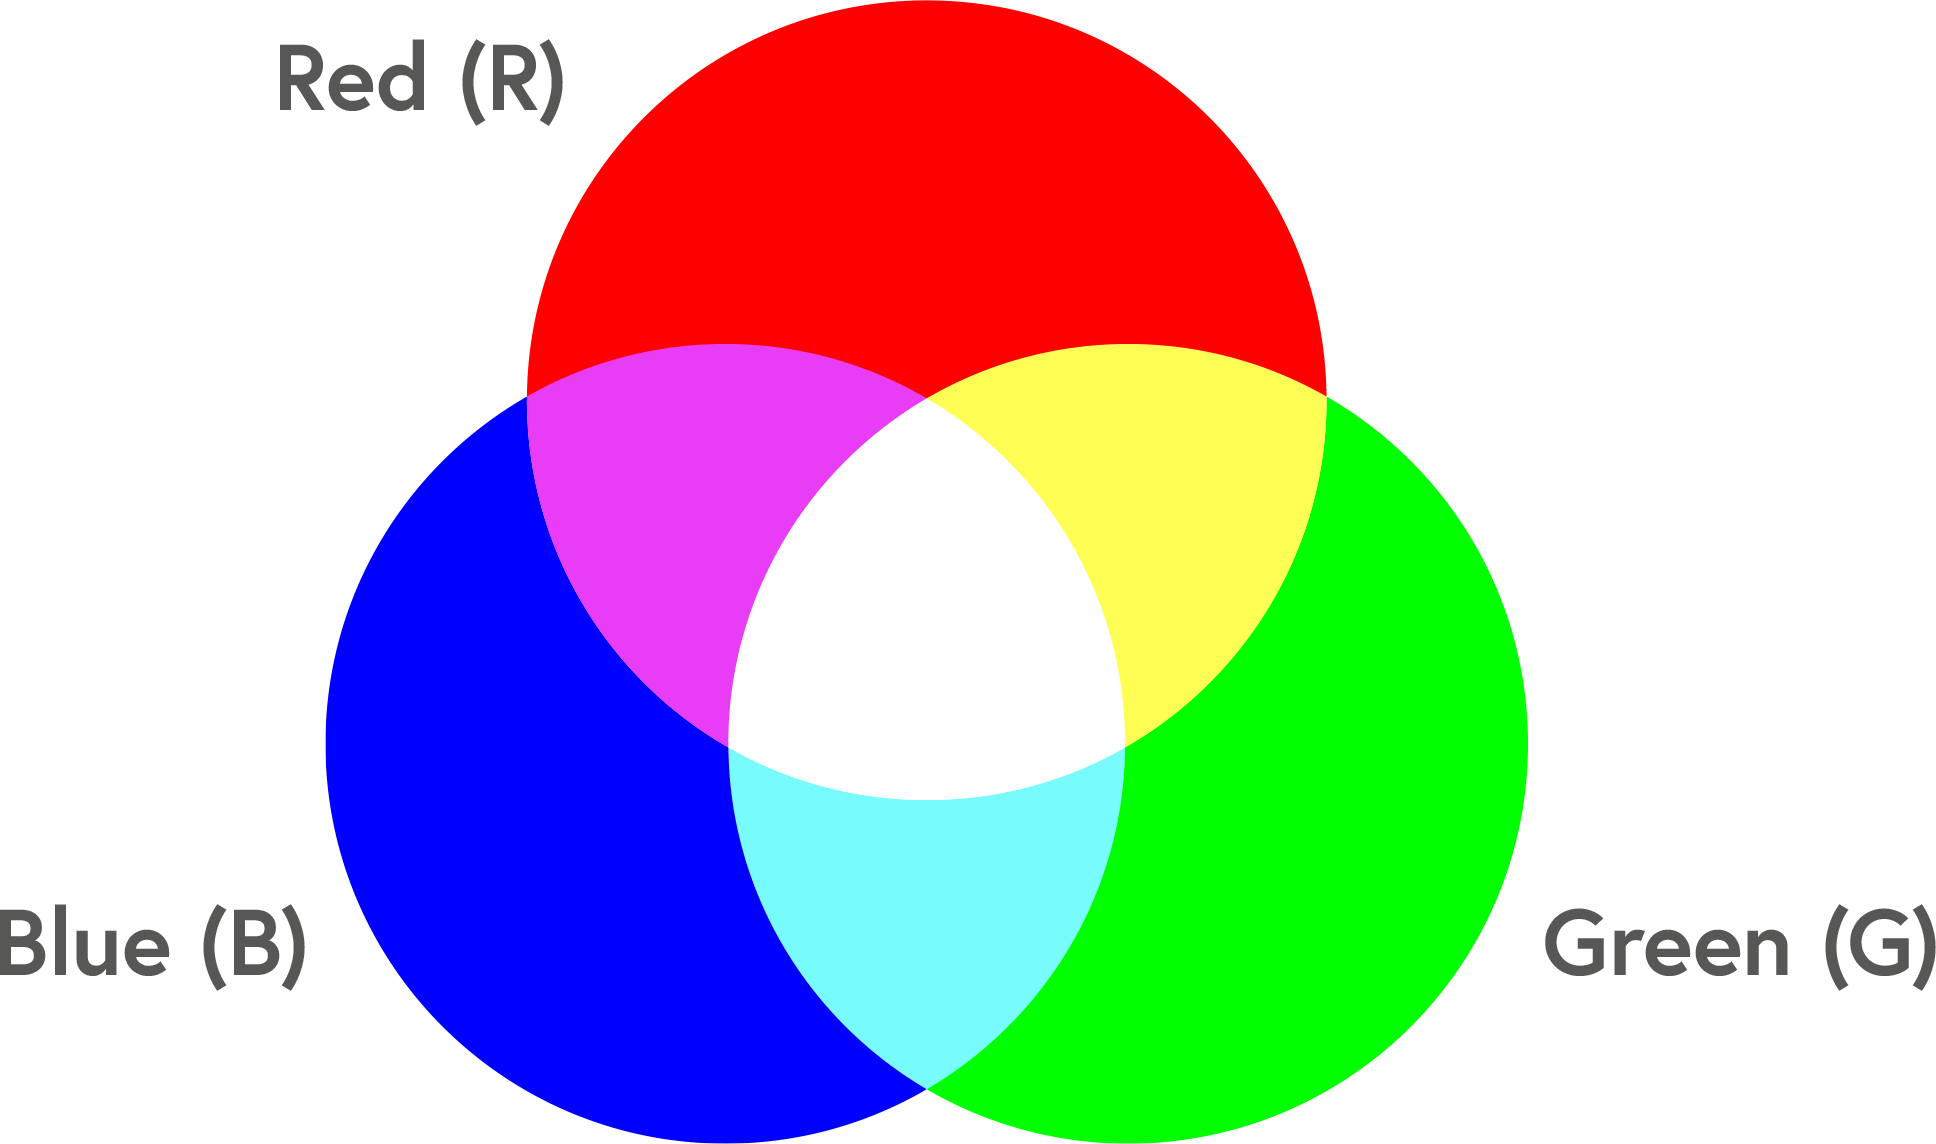 The RGB colour model